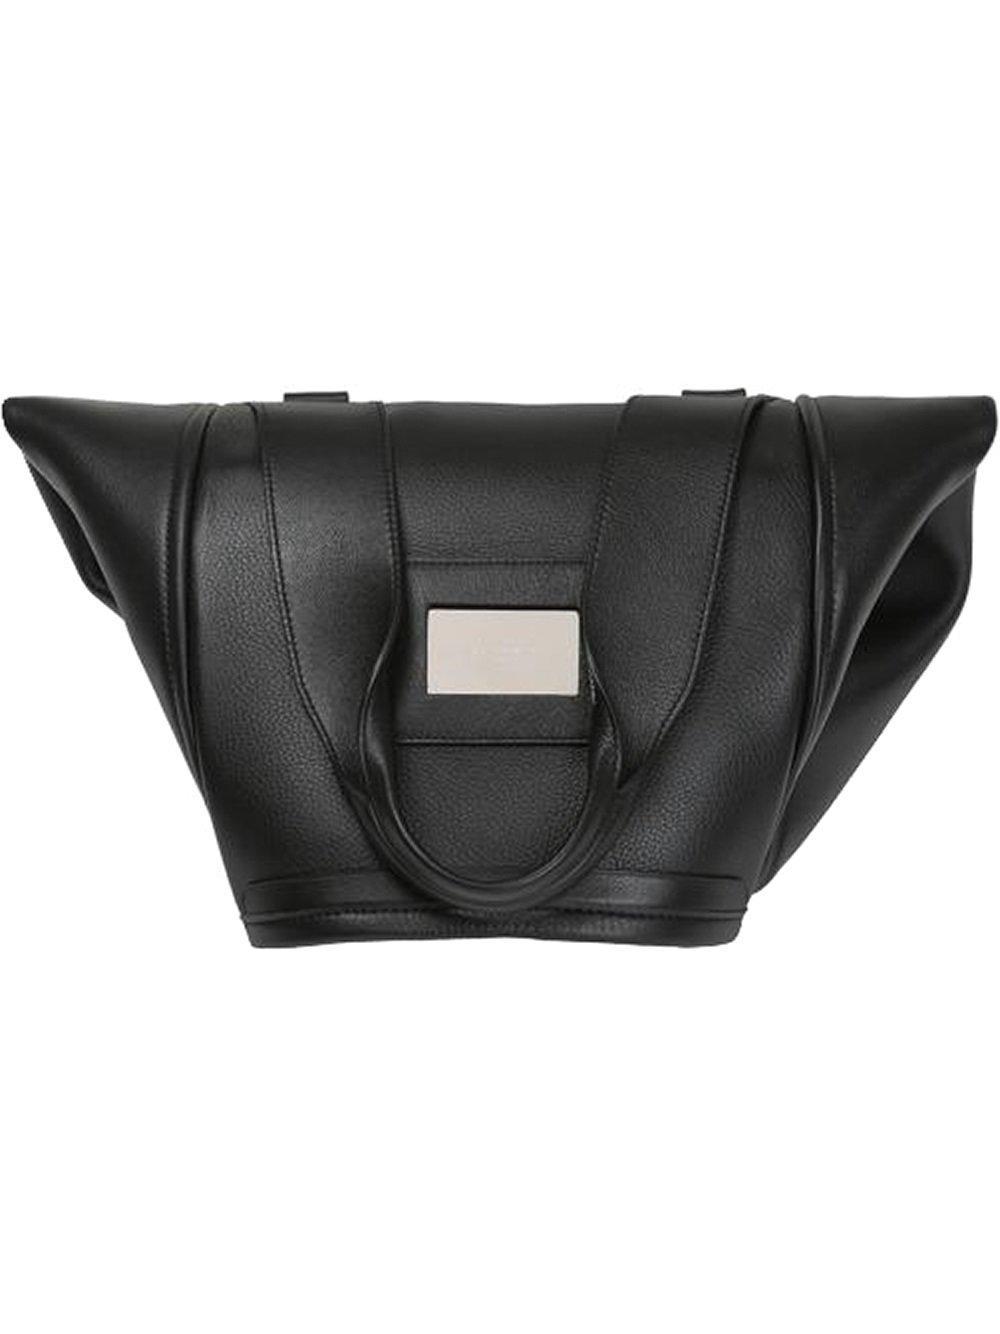 d939908499 Balenciaga - Black - Foldover Tote - Women - Calf Leather - One Size - Lyst